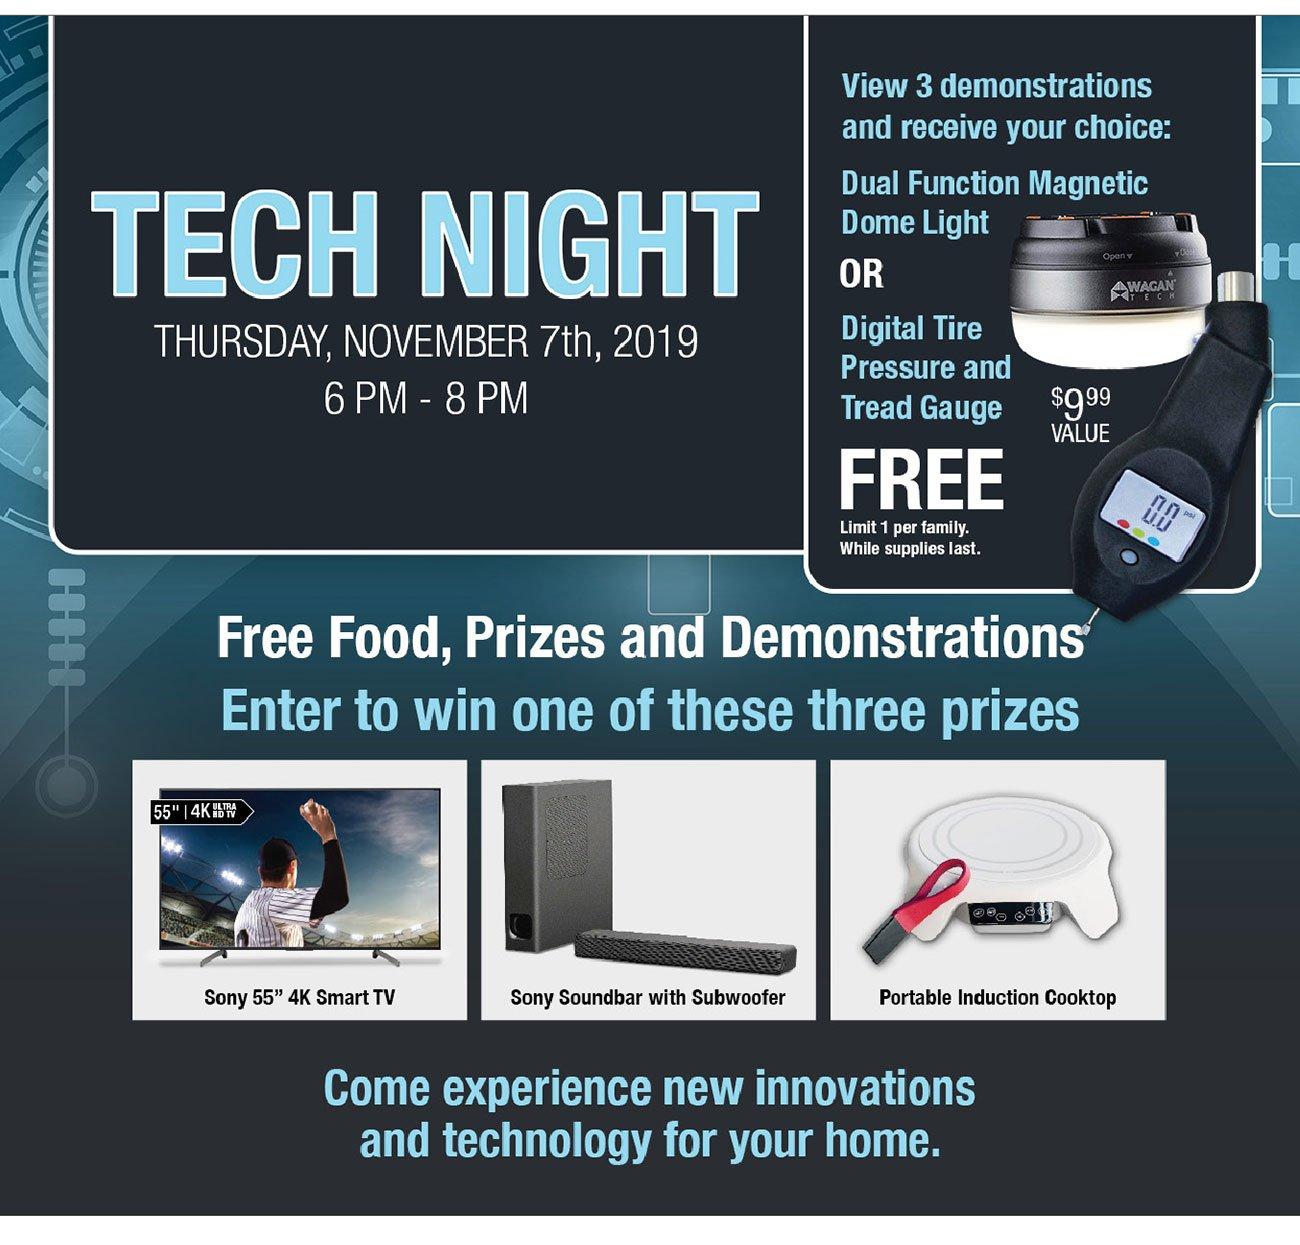 Tech-night